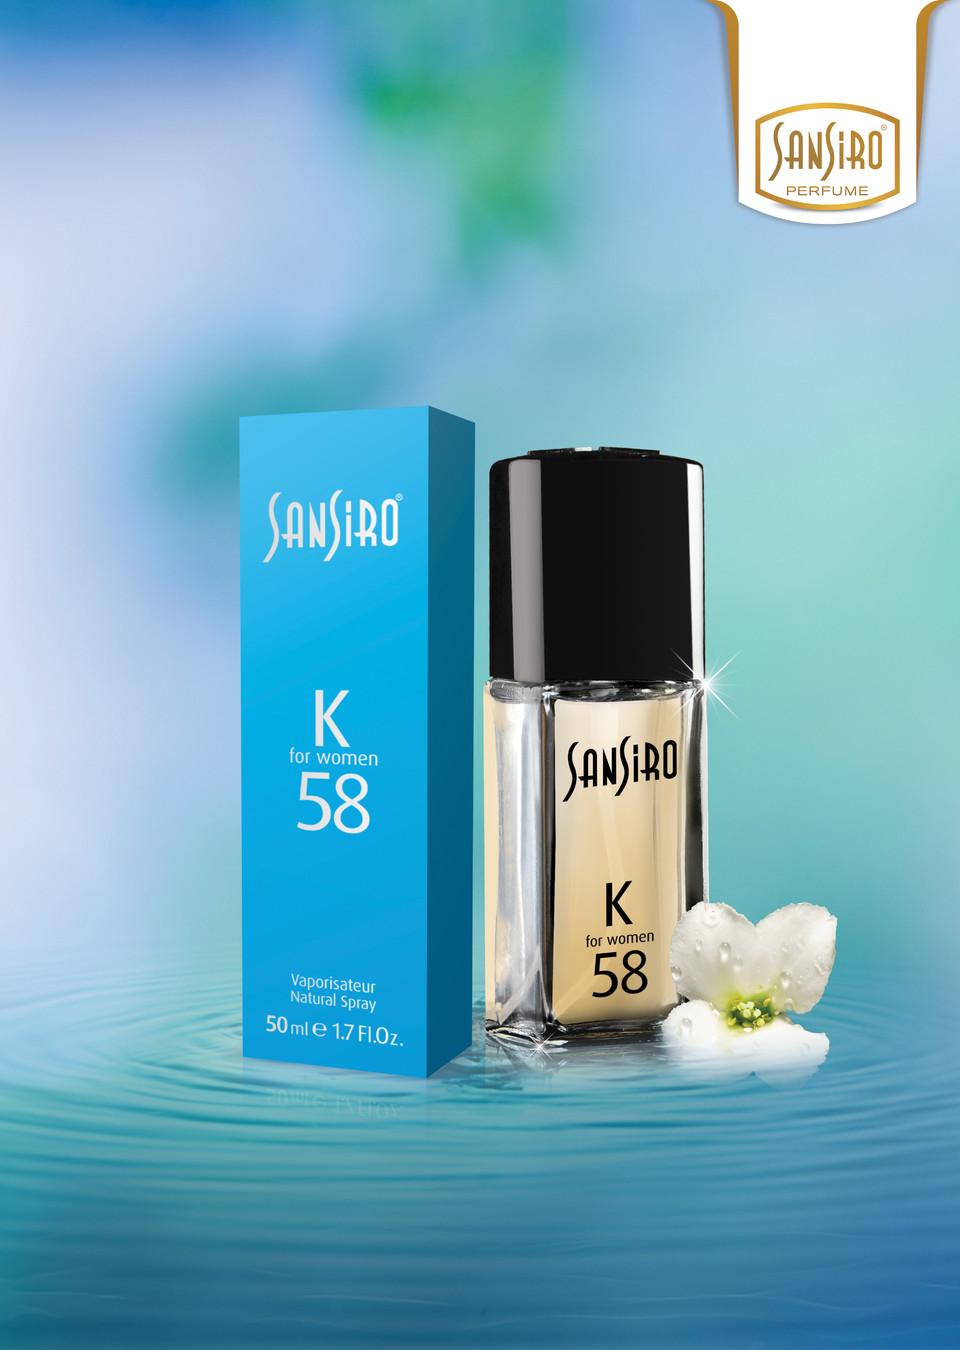 Sansiro Perfume - For Women - Melis (K58)